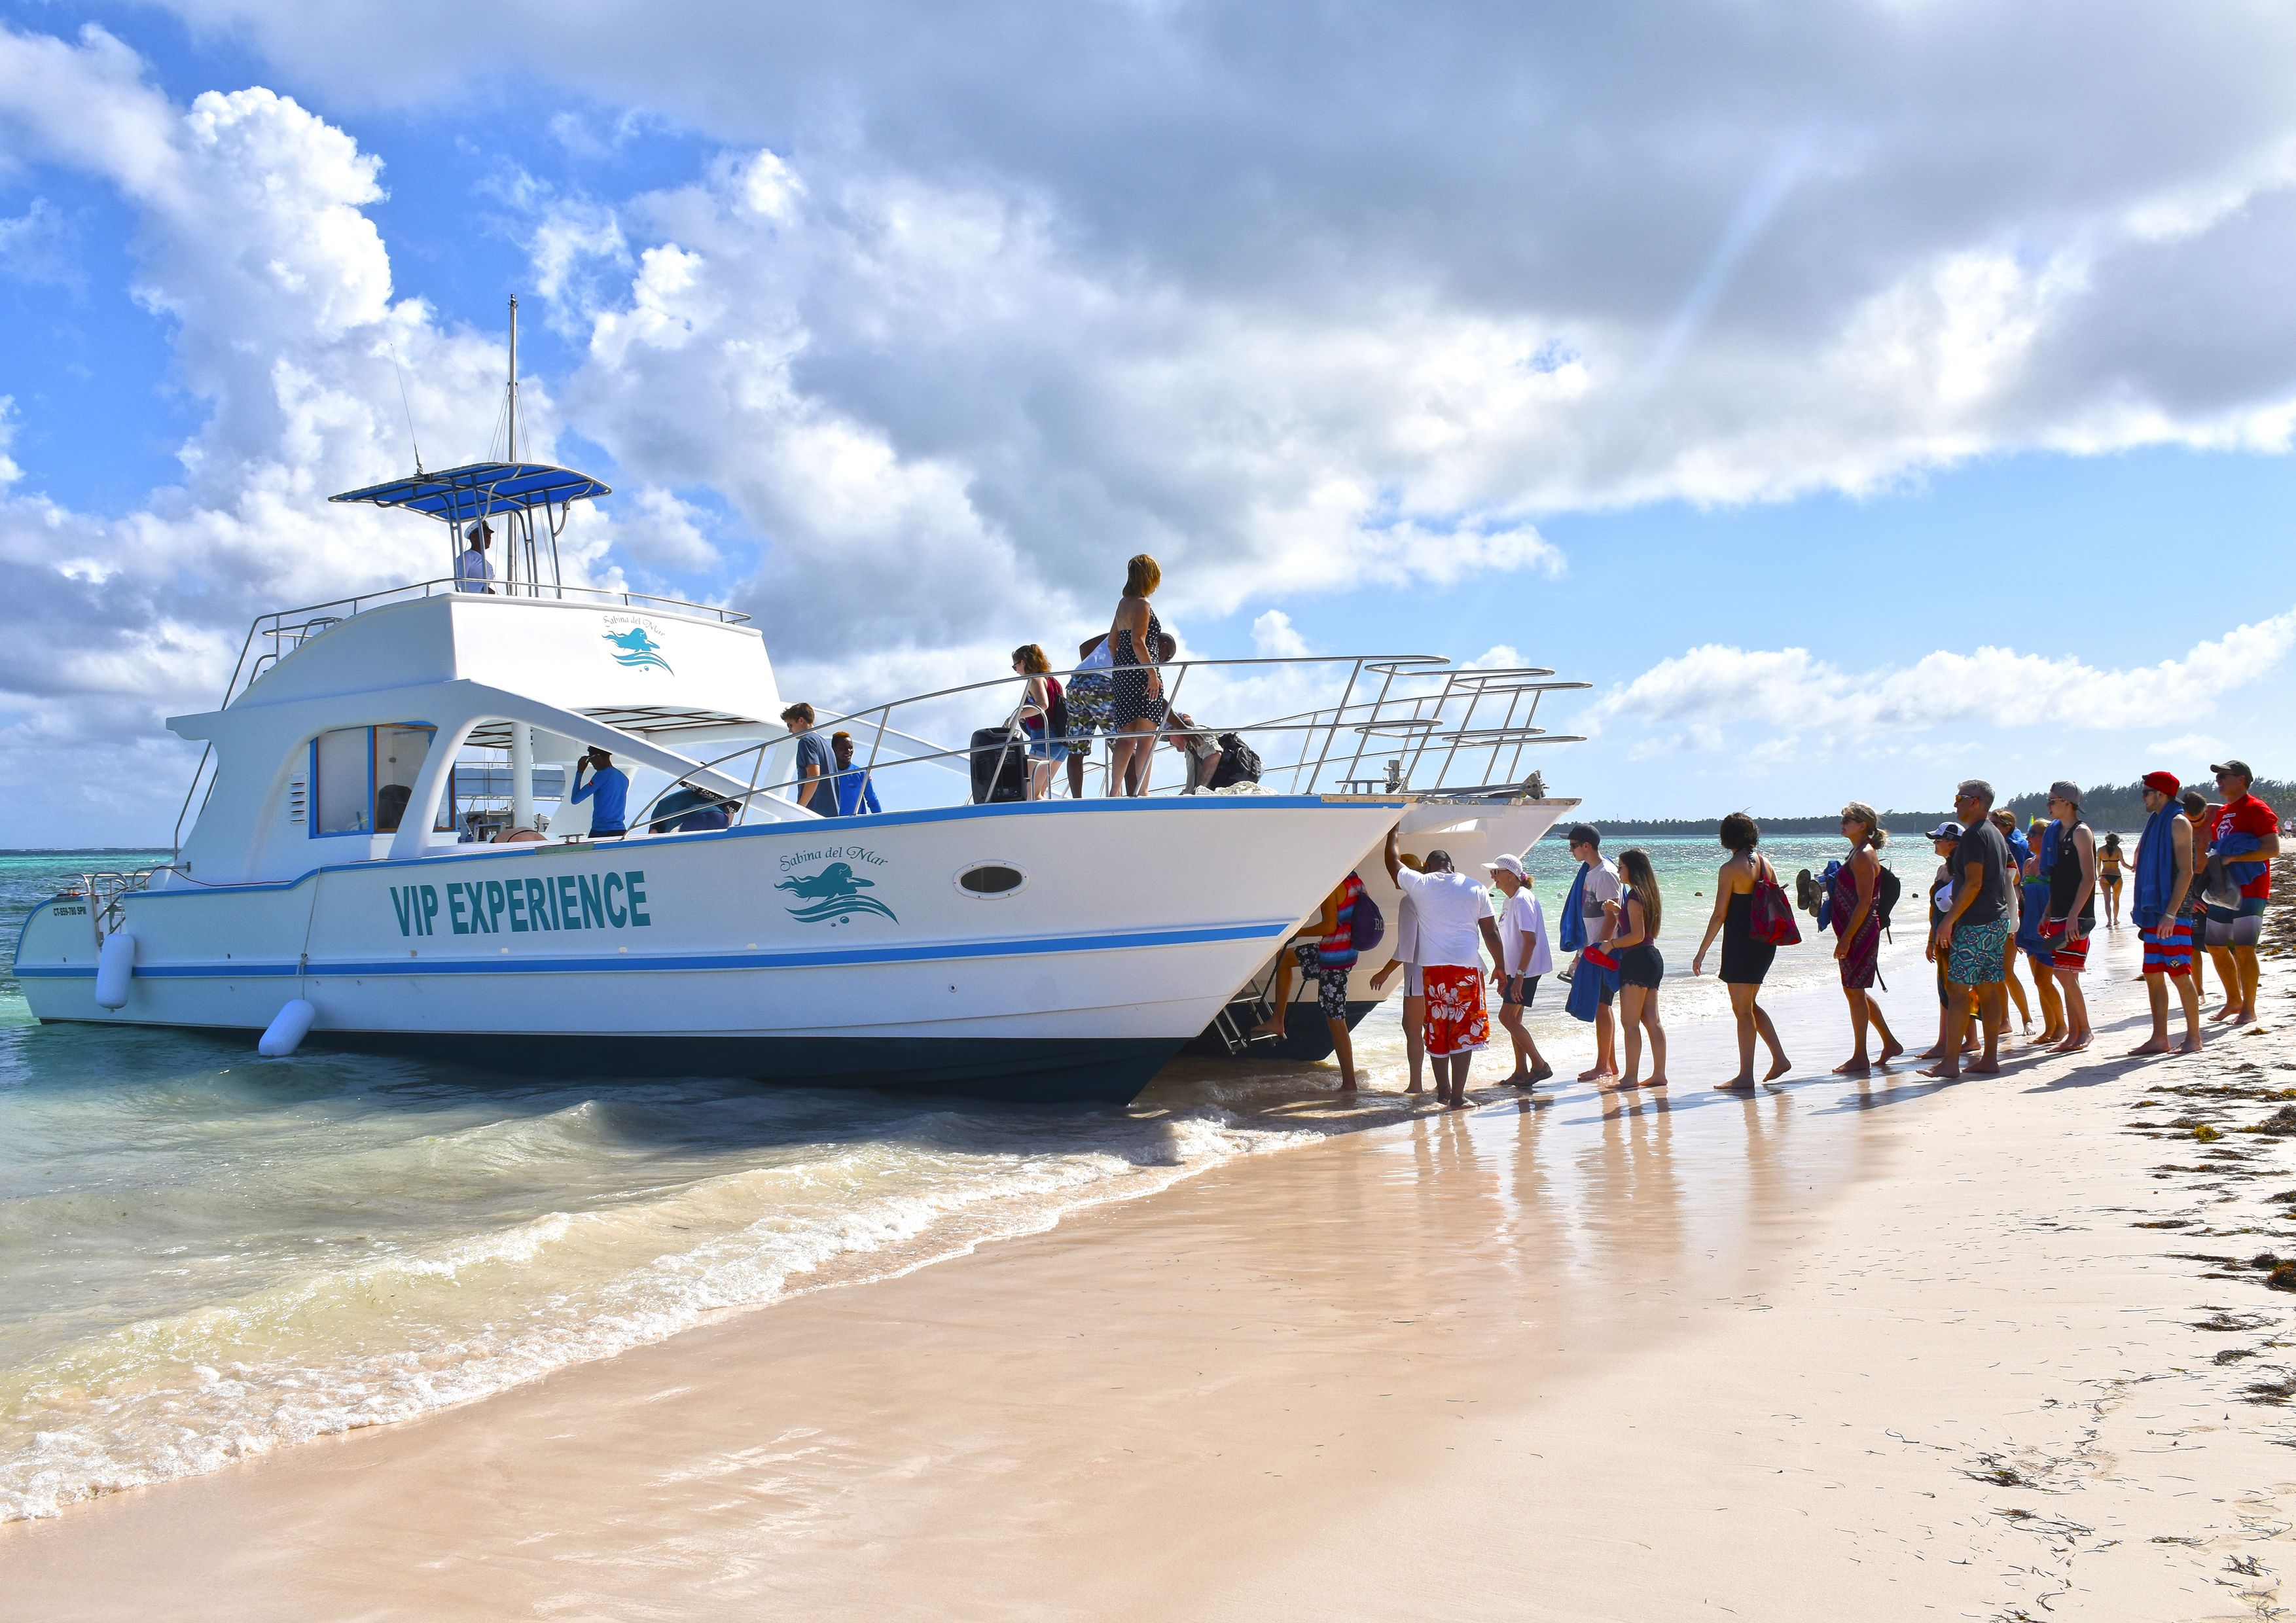 Tour group boarding a catamaran in Punta Cana